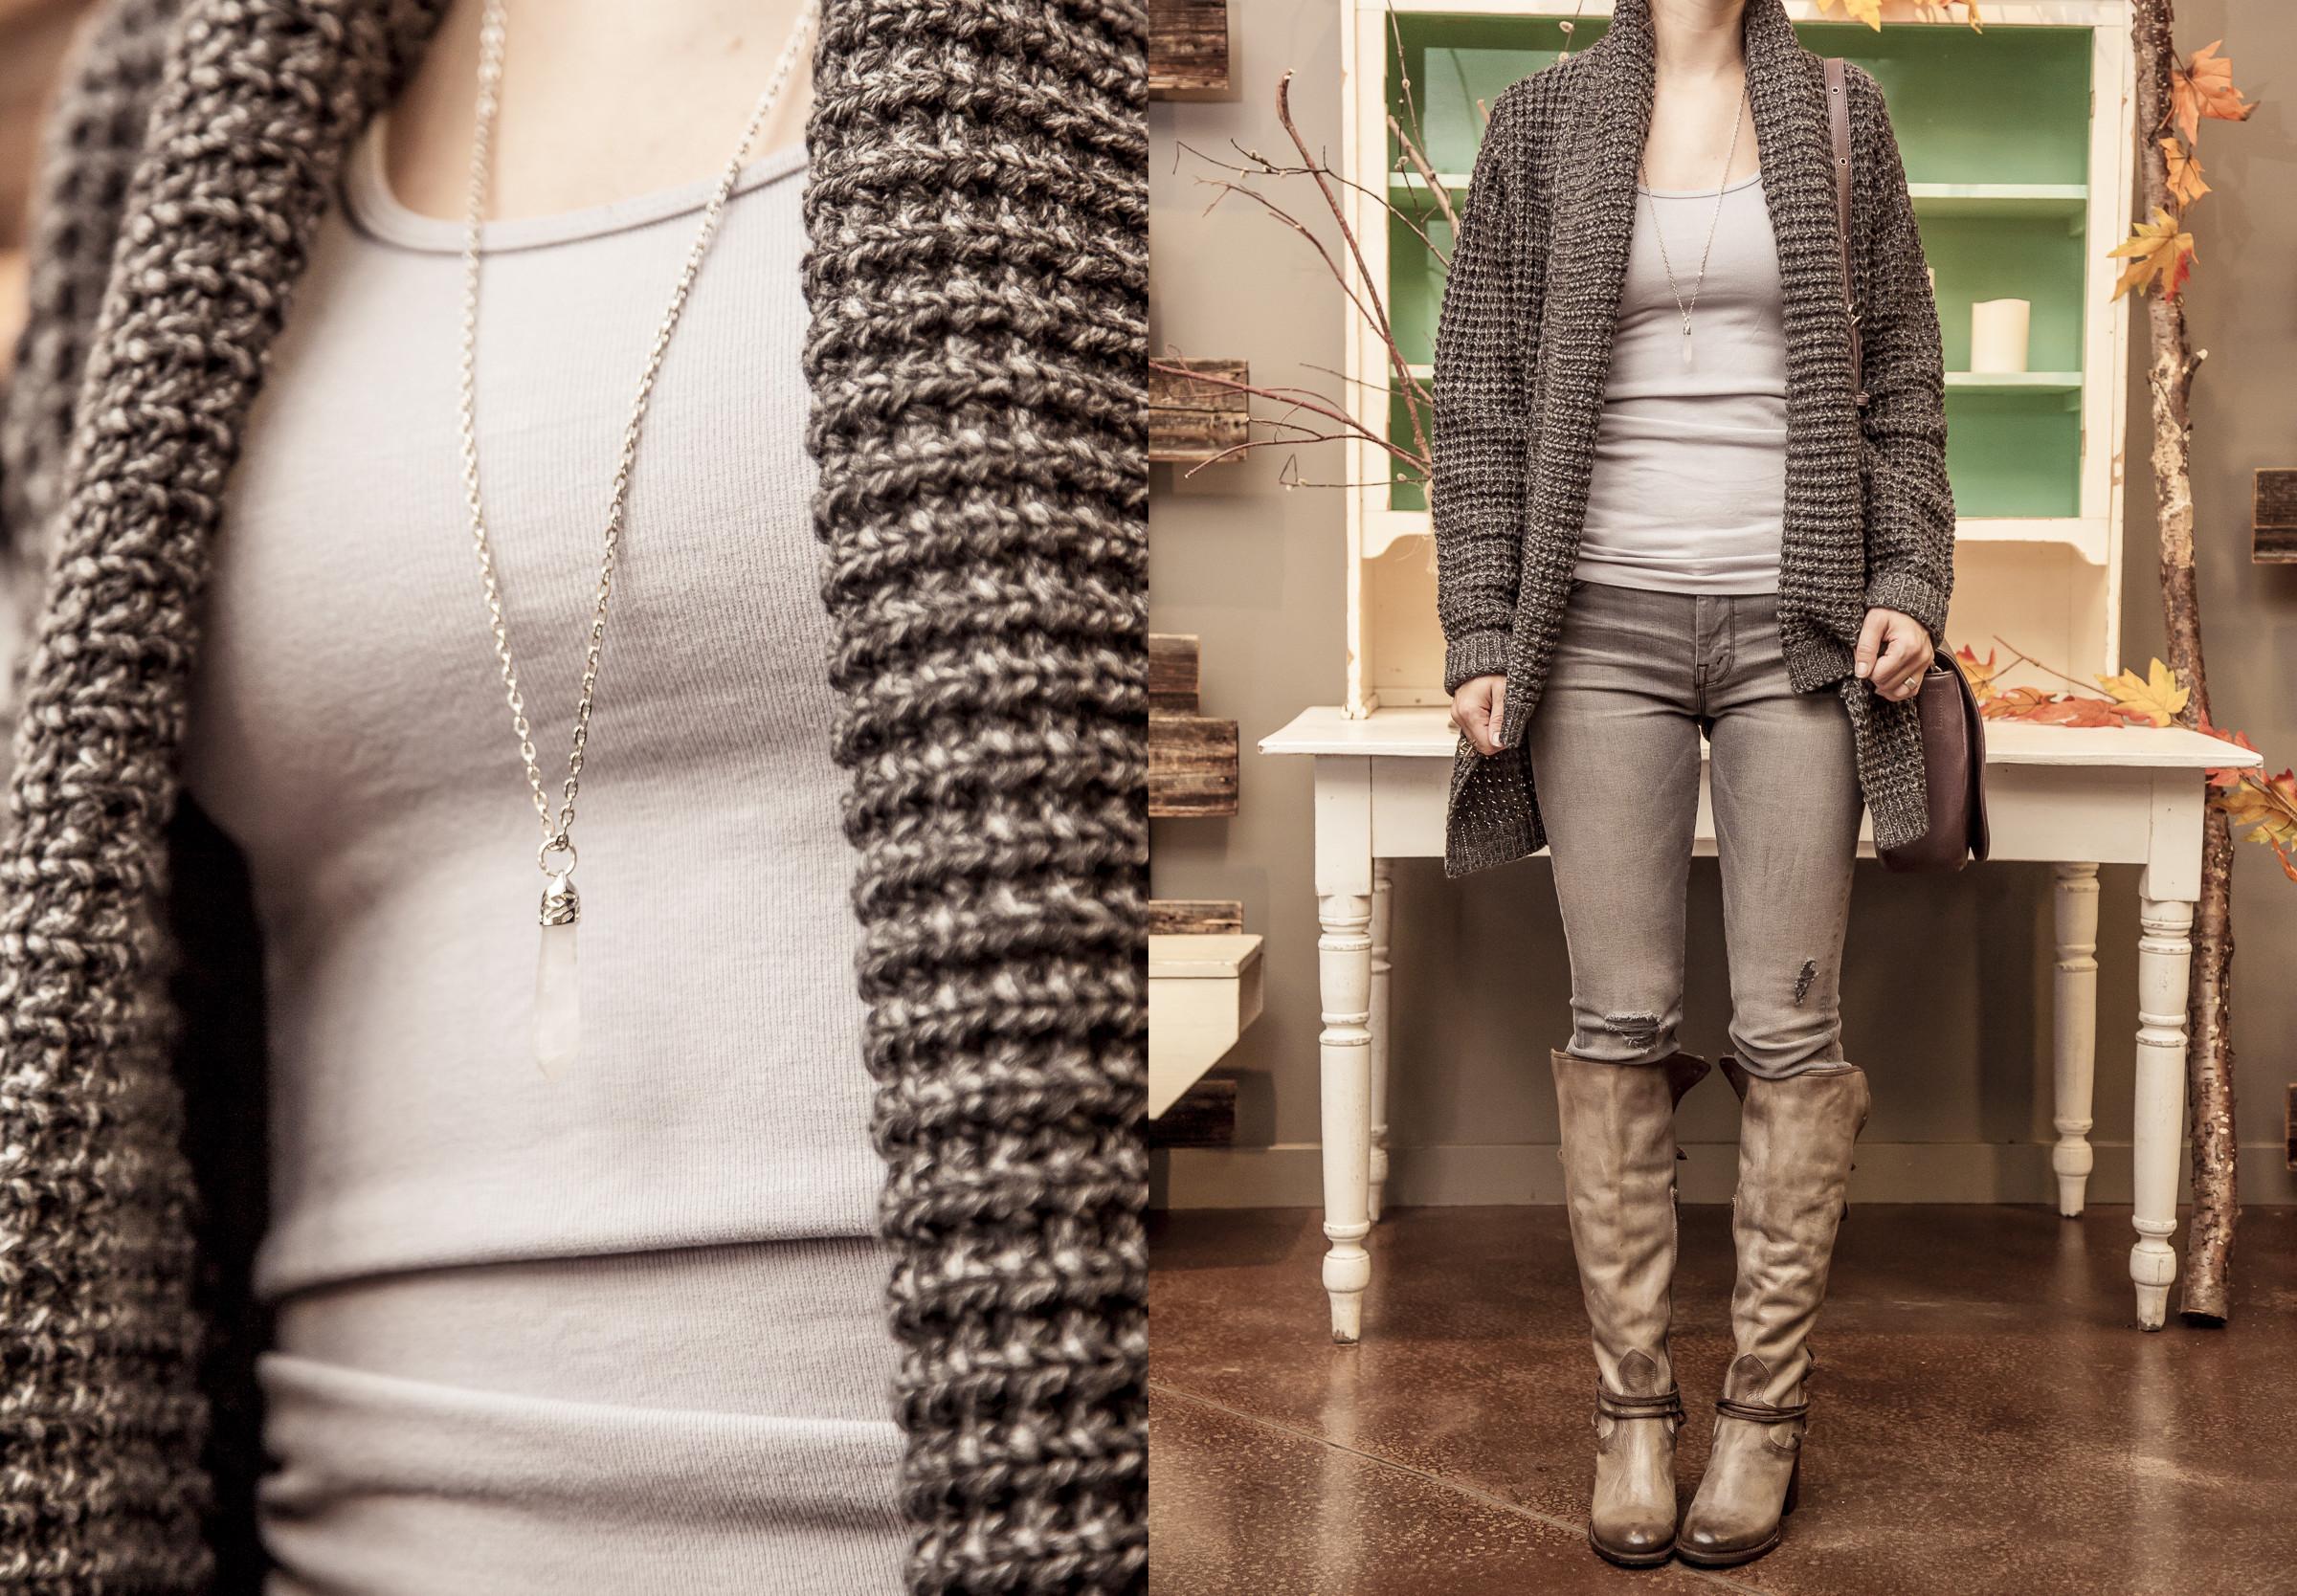 womens-fashion-fall-arrivals-at-bella-maas-boutique